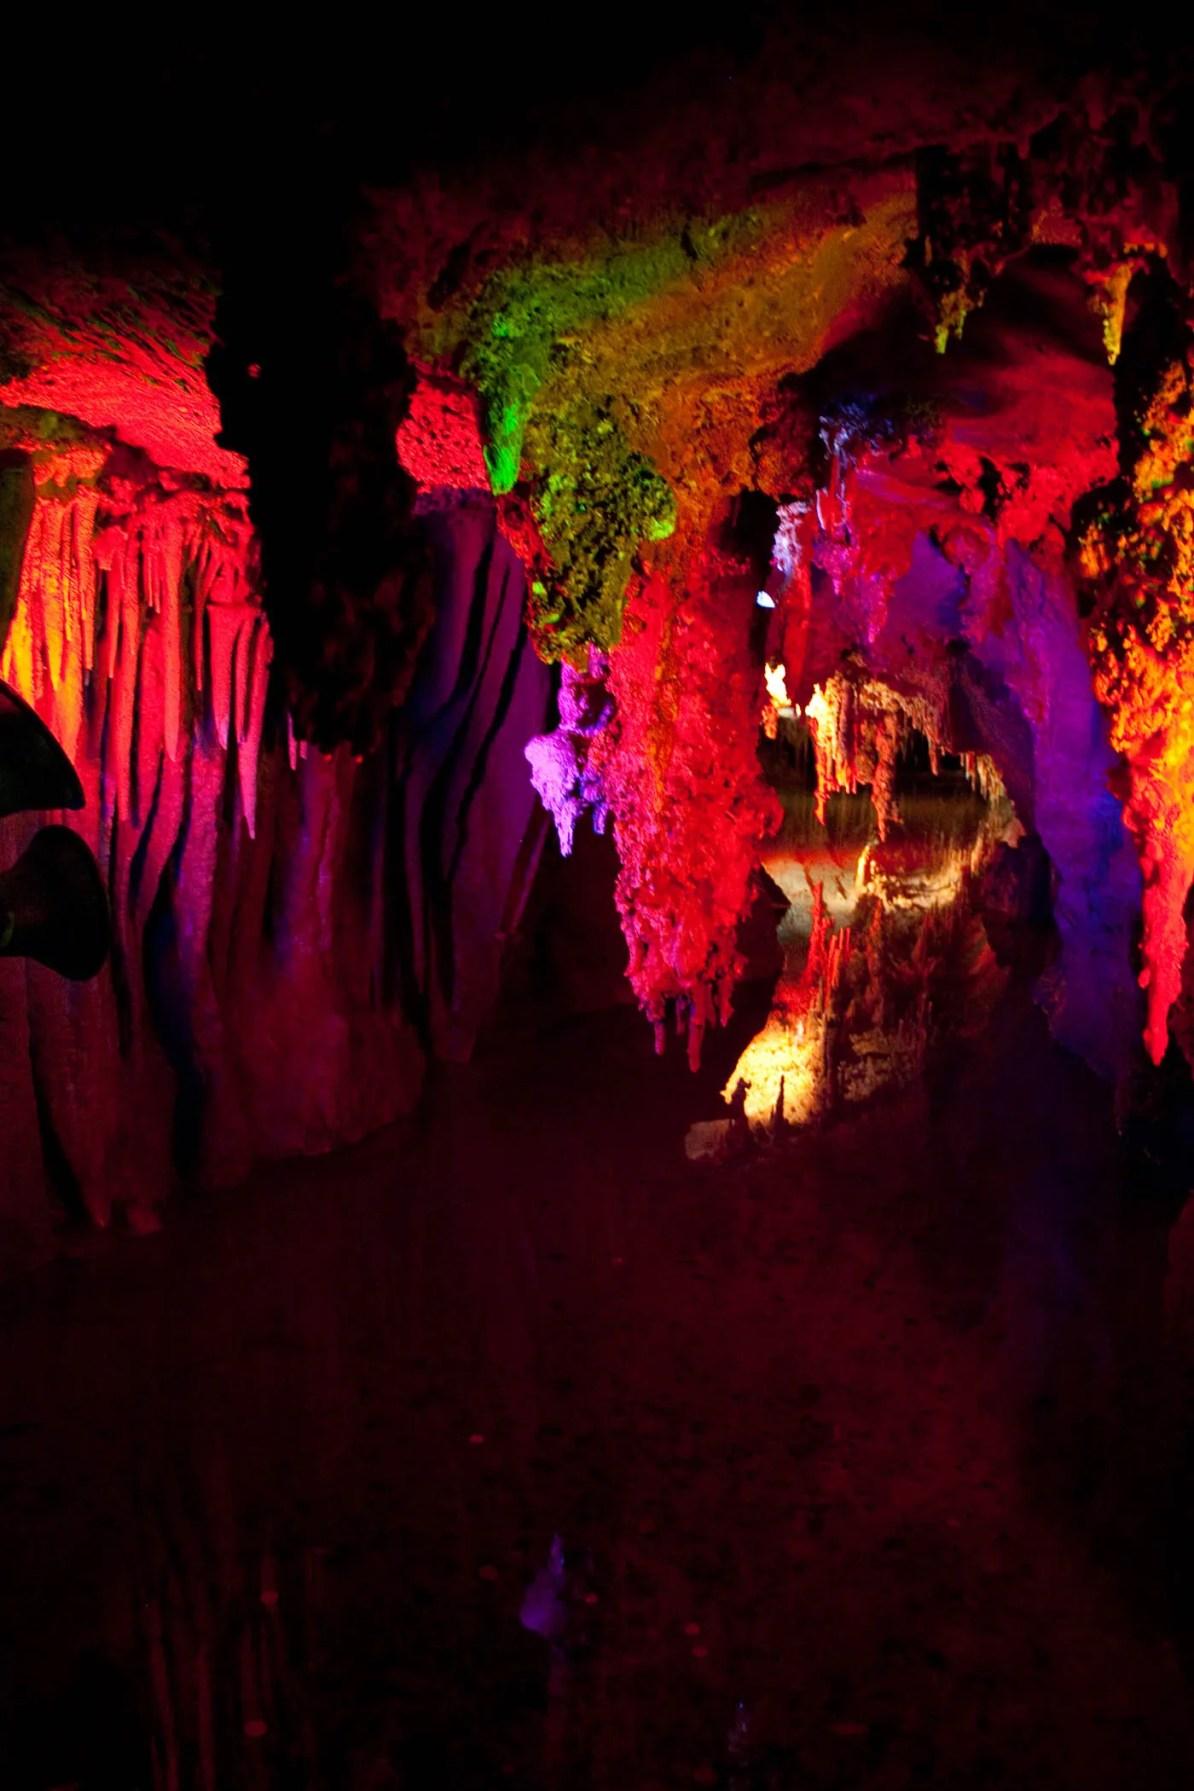 Shenandoah Caverns in Virginia